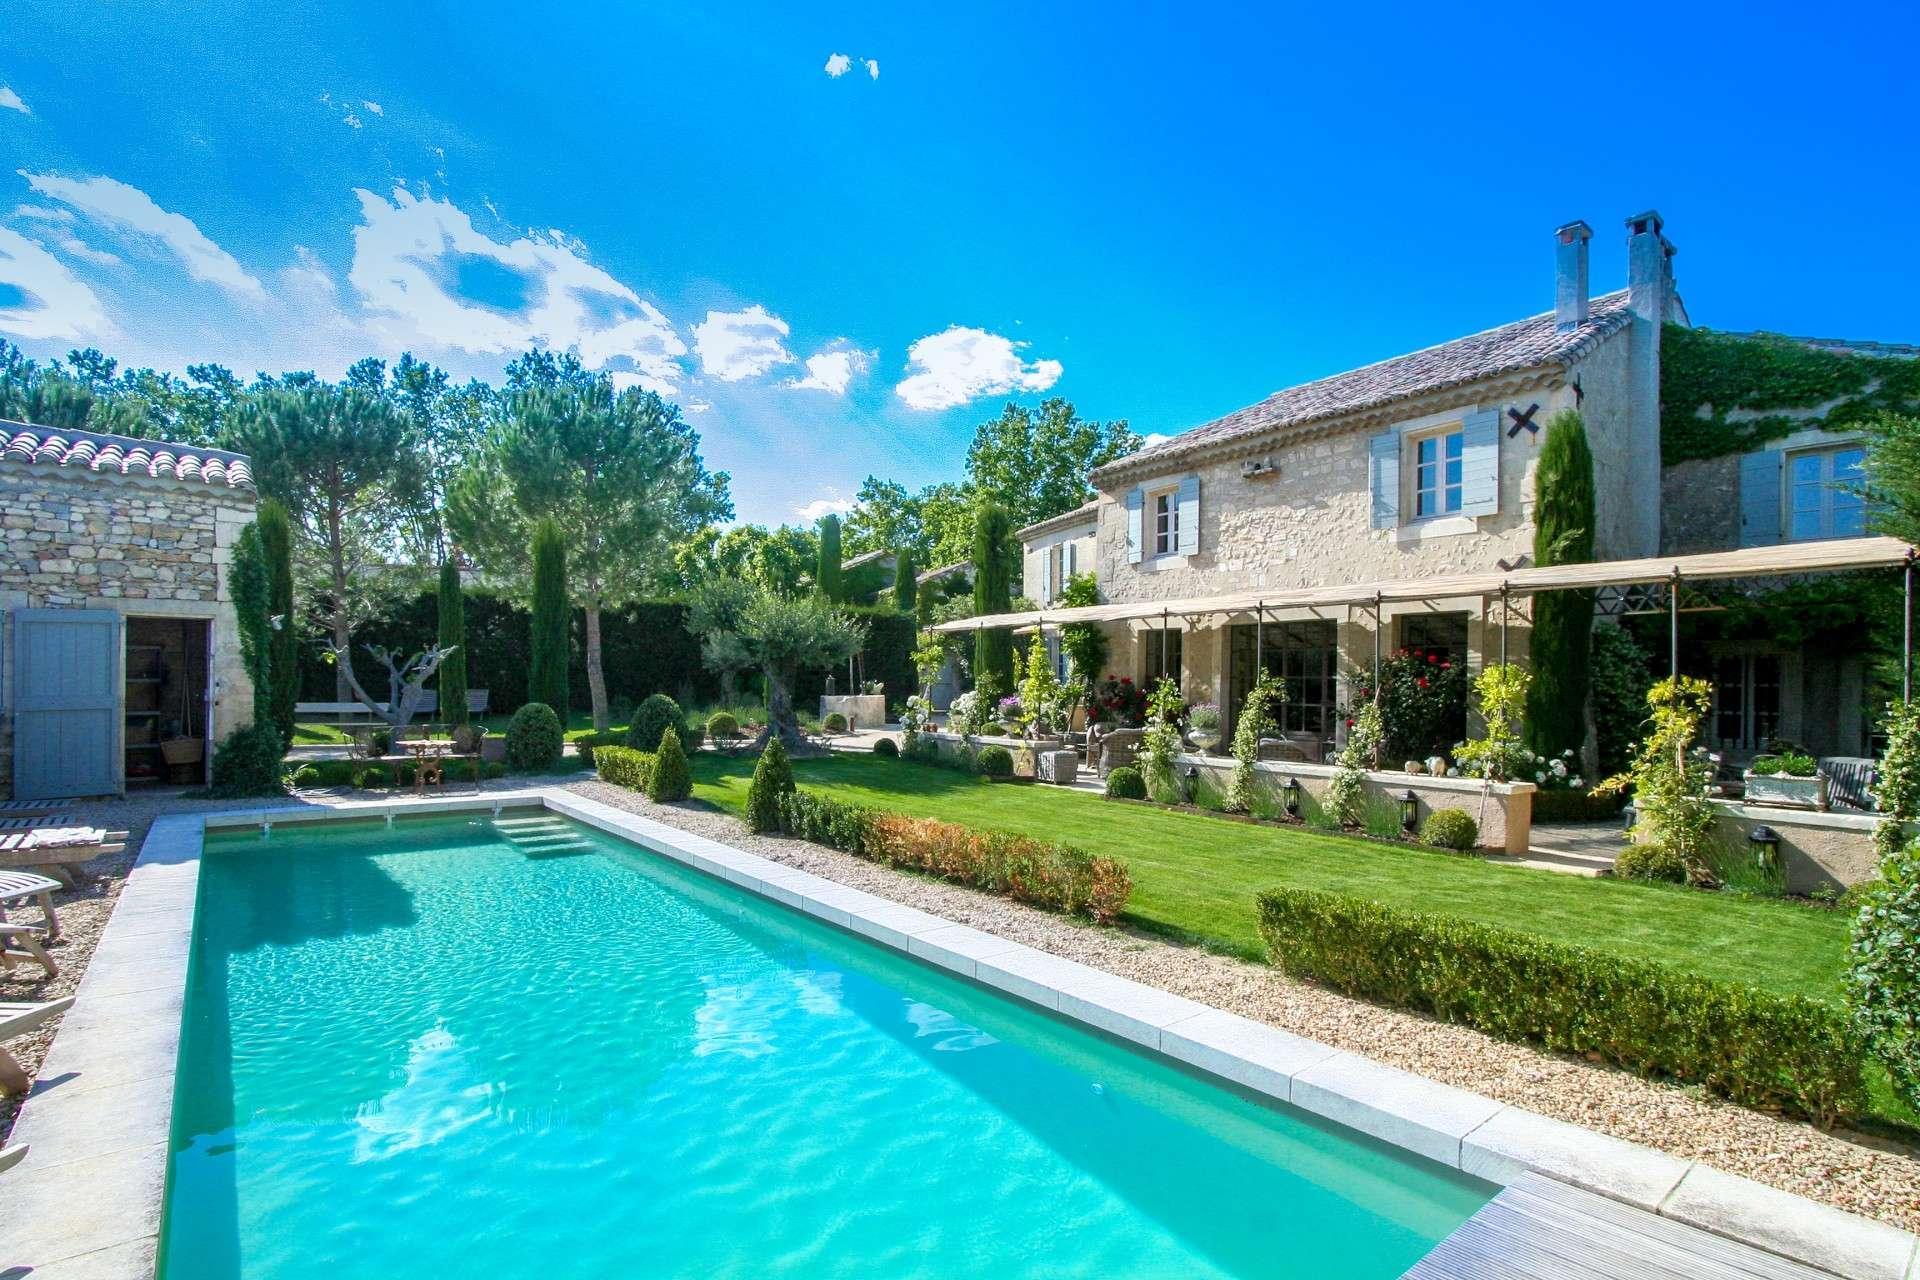 Luxury vacation rentals europe - France - Provence ih - Saint remy de provence - Le Clos du Cypres - Image 1/16